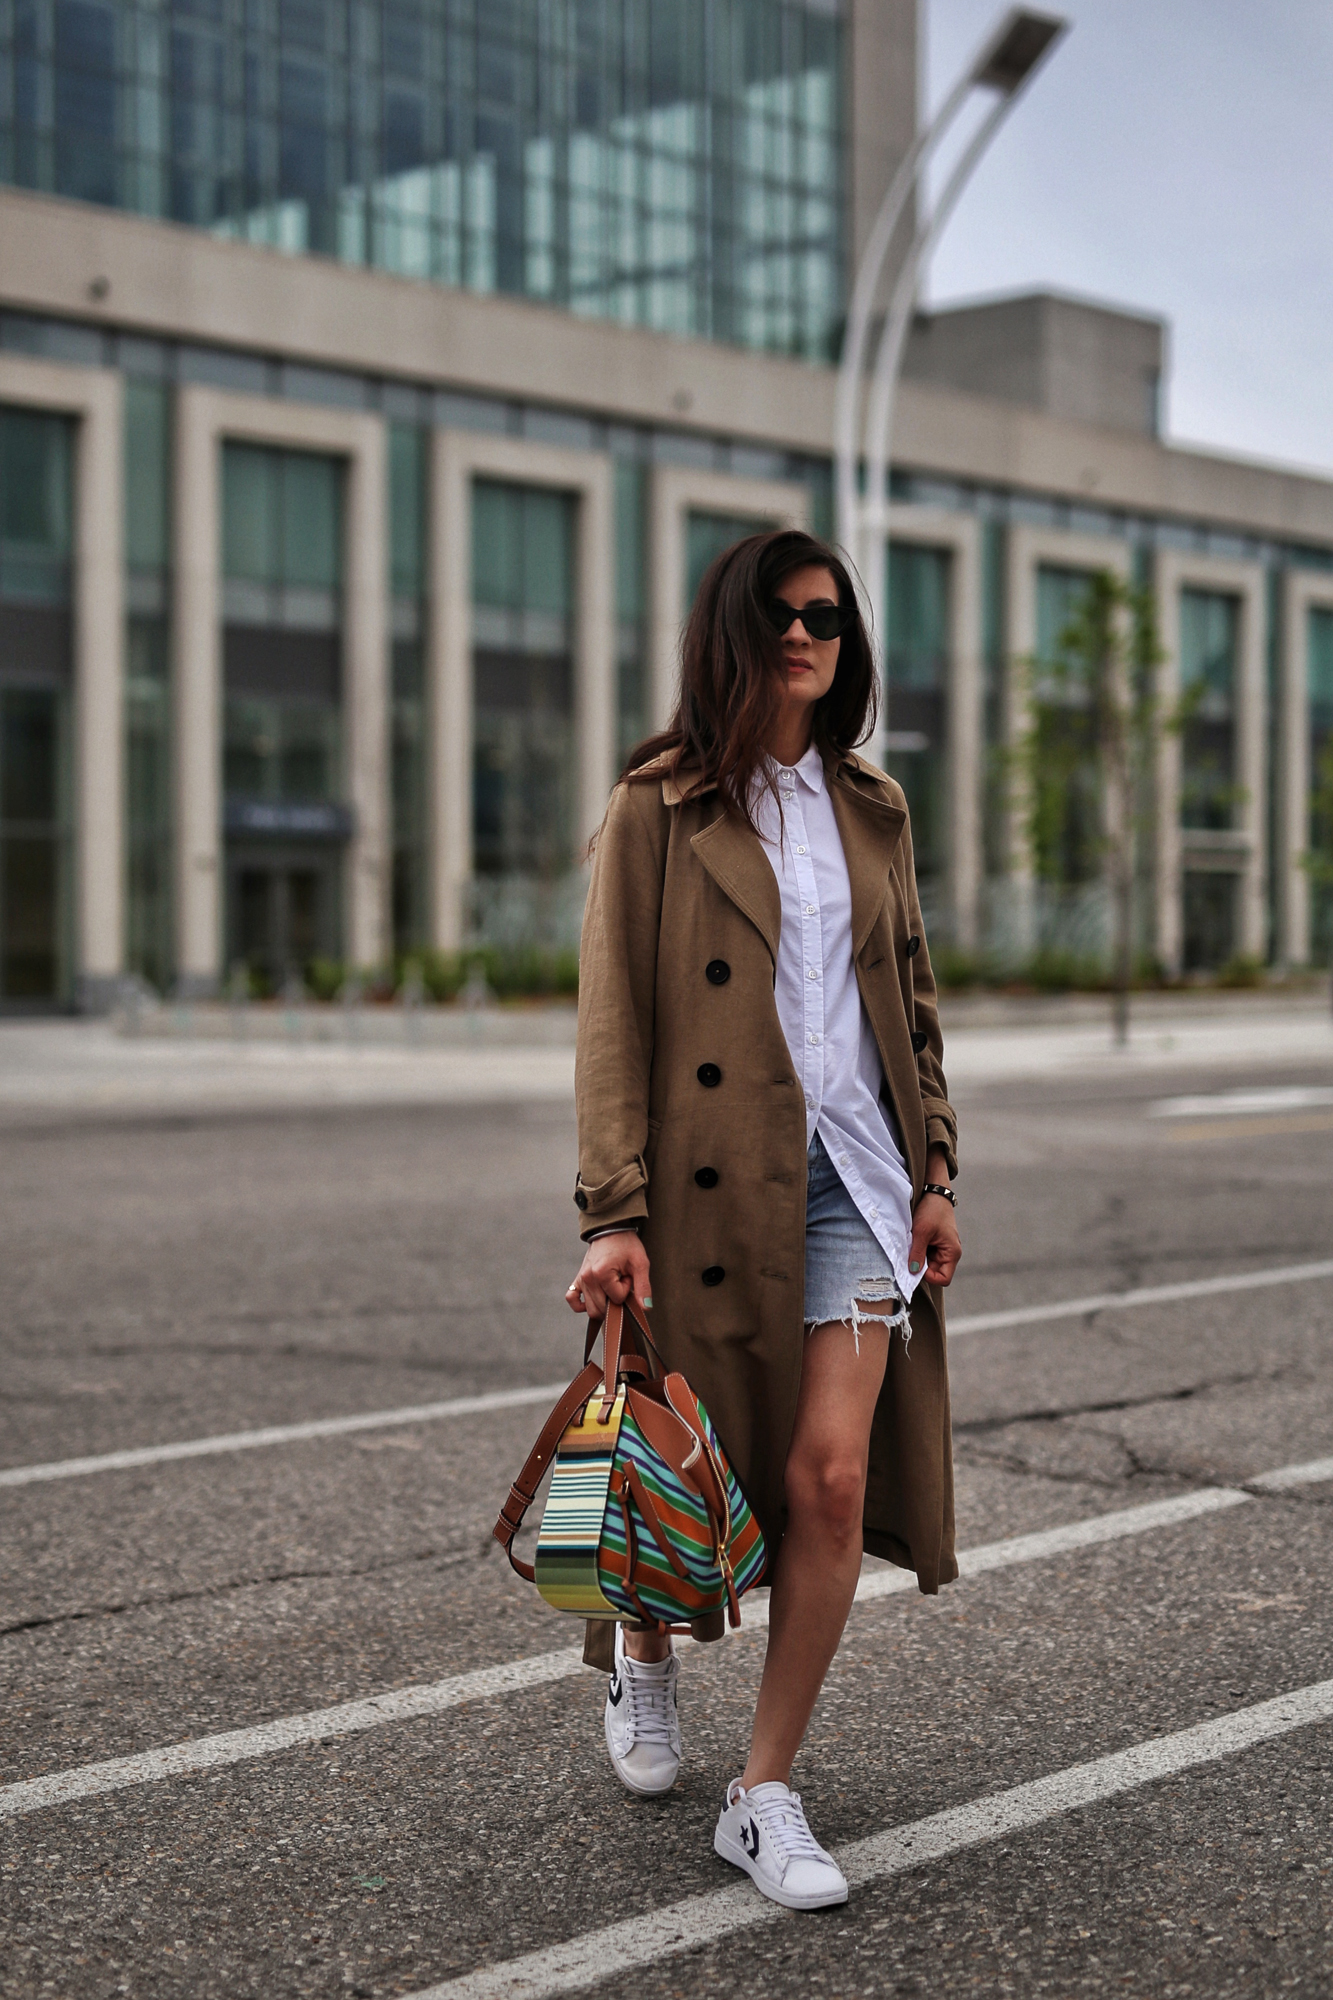 woahstyle.com 2018 - zara linen trench coat, free people cut off shorts, converse one stars, loewe striped small hammock bag, white button up shirt - toronto street style - hotel x - nathalie martin 11.jpg